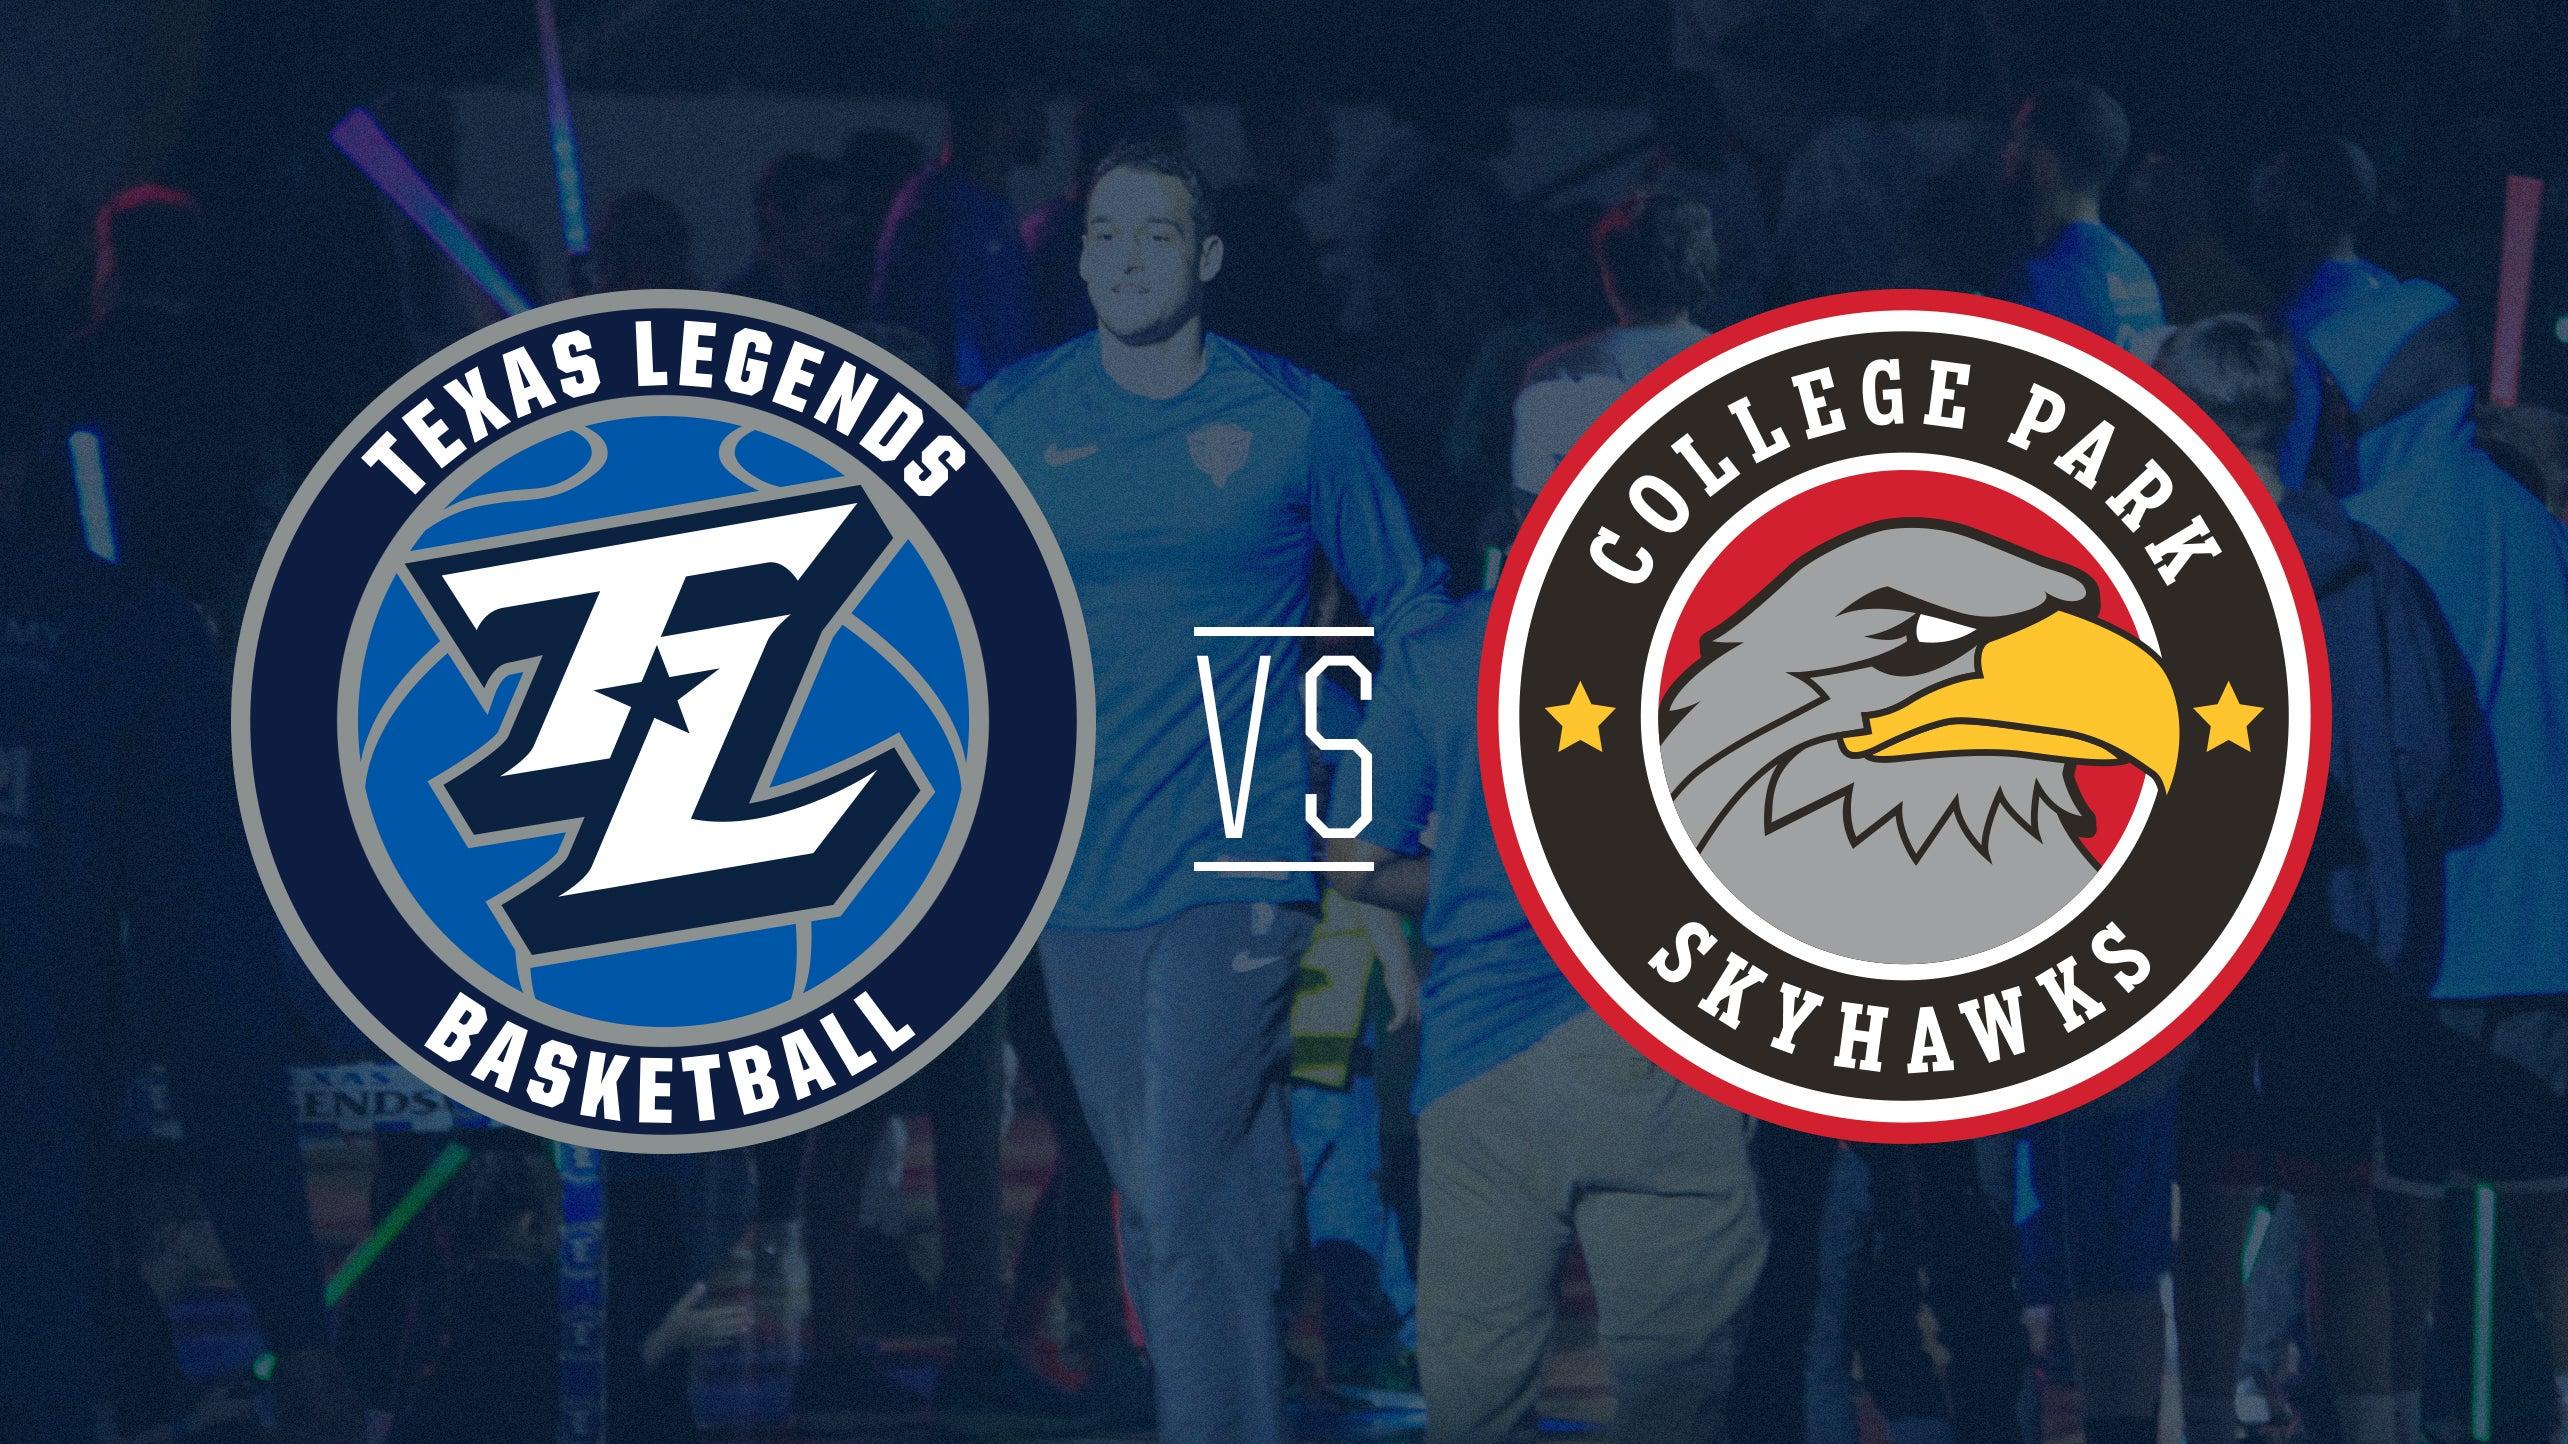 Texas Legends vs College Park Skyhawks